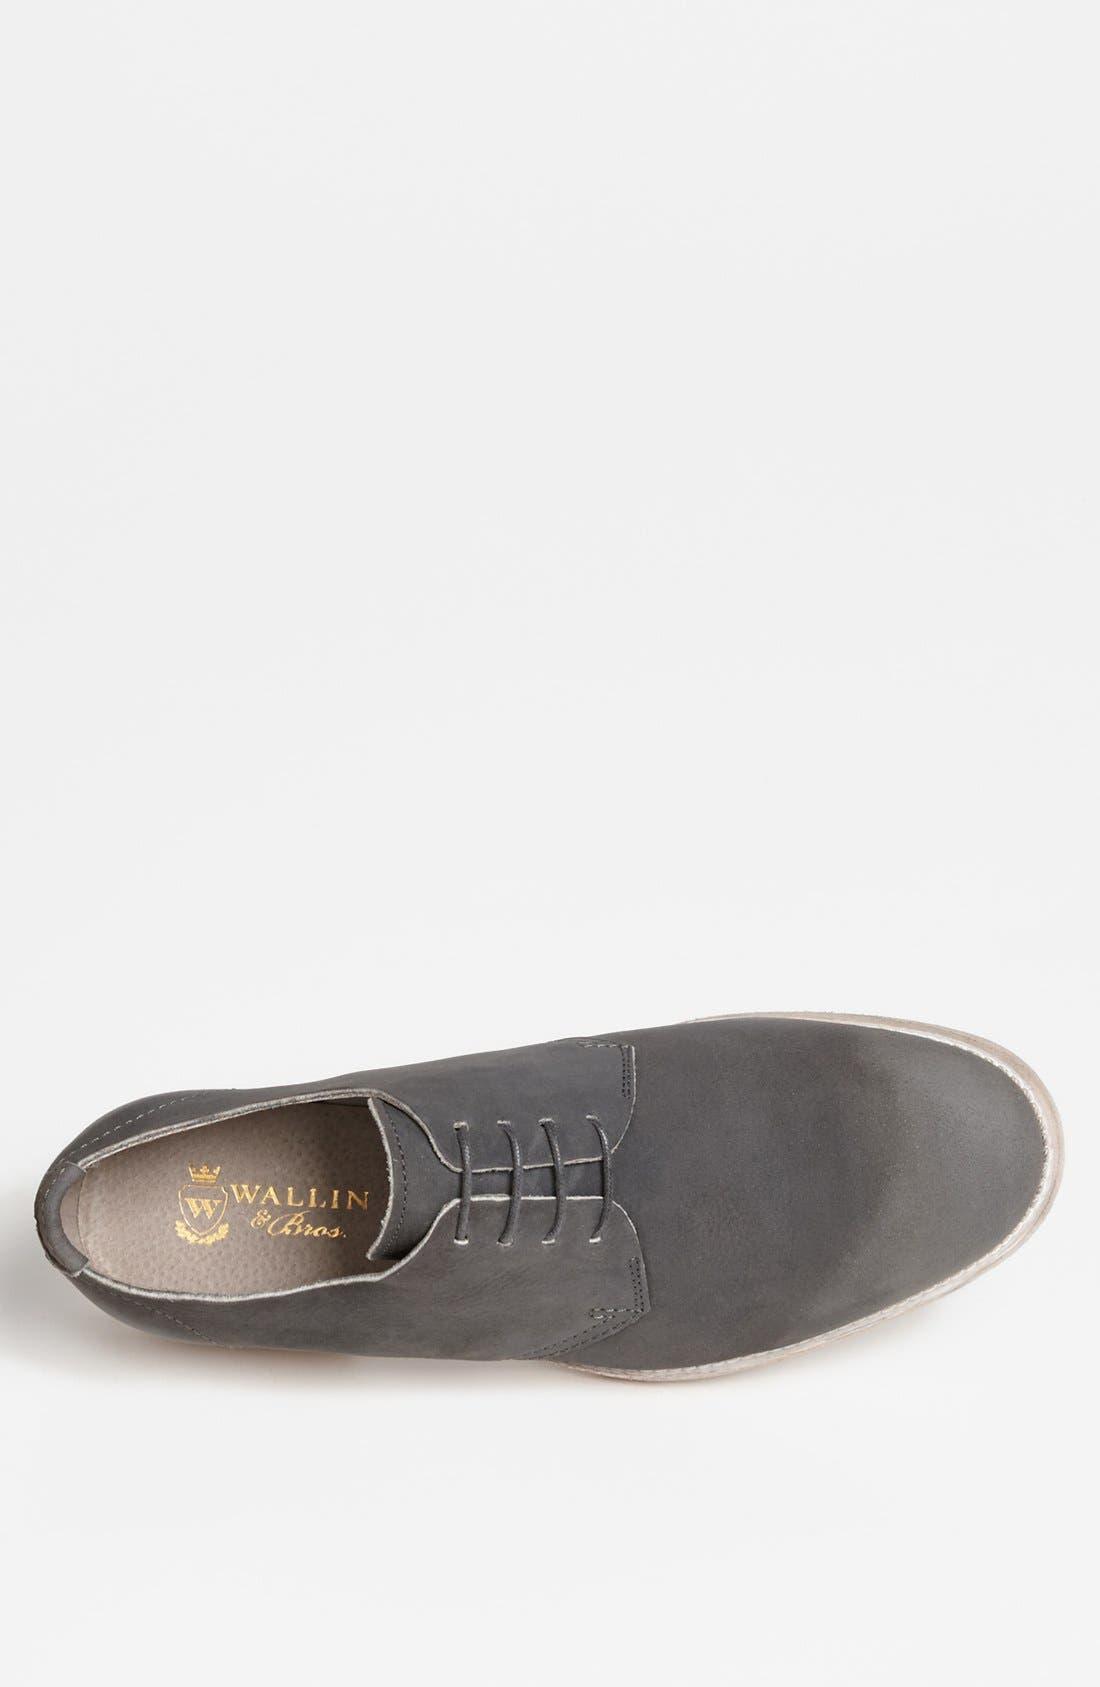 Alternate Image 3  - Wallin & Bros. 'James' Buck Shoe